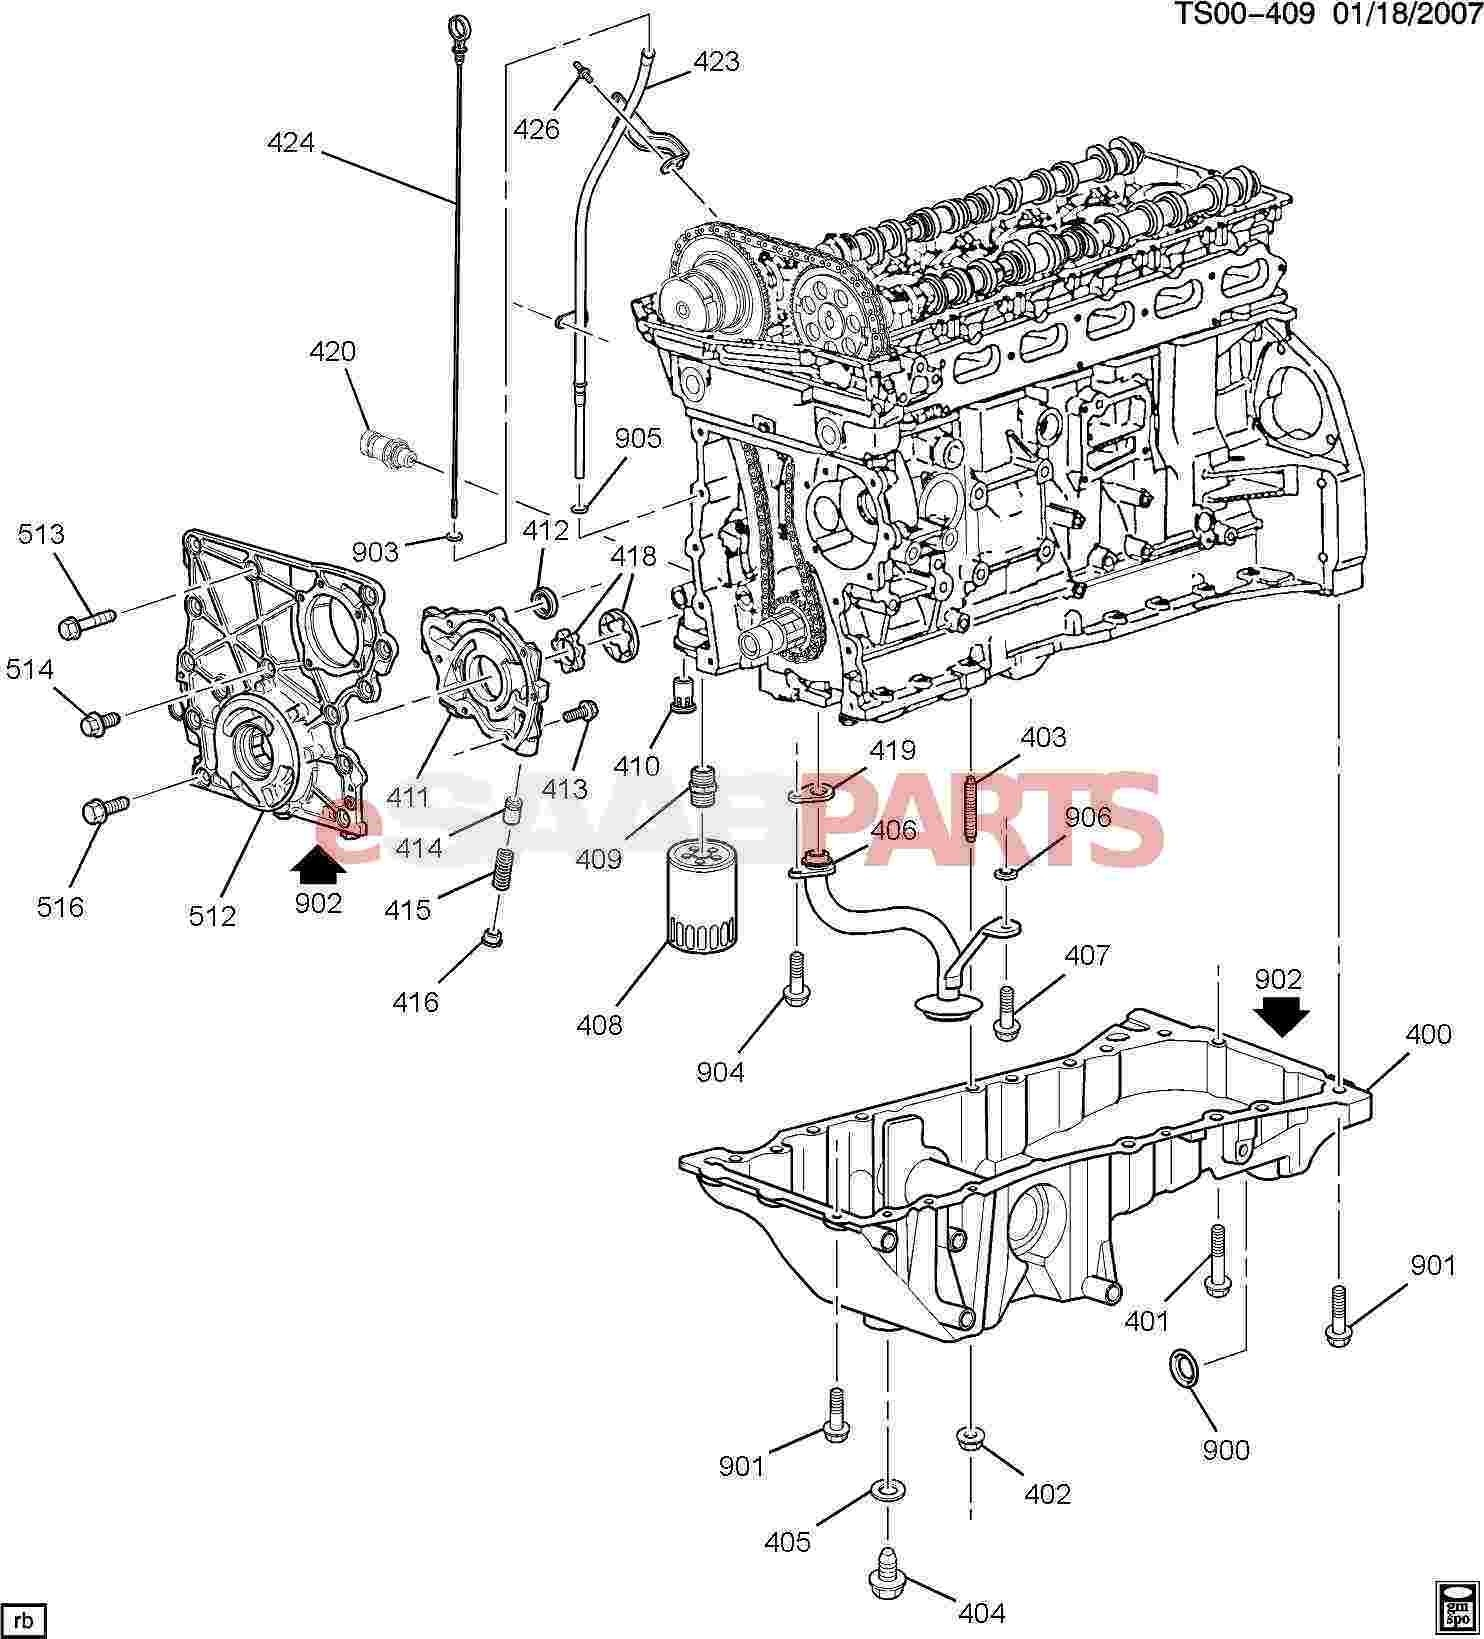 Car Engine Part Diagram Auto Engine Parts Diagram ] Saab Plug M16x1 5—14 24 Od society Of Car Engine Part Diagram